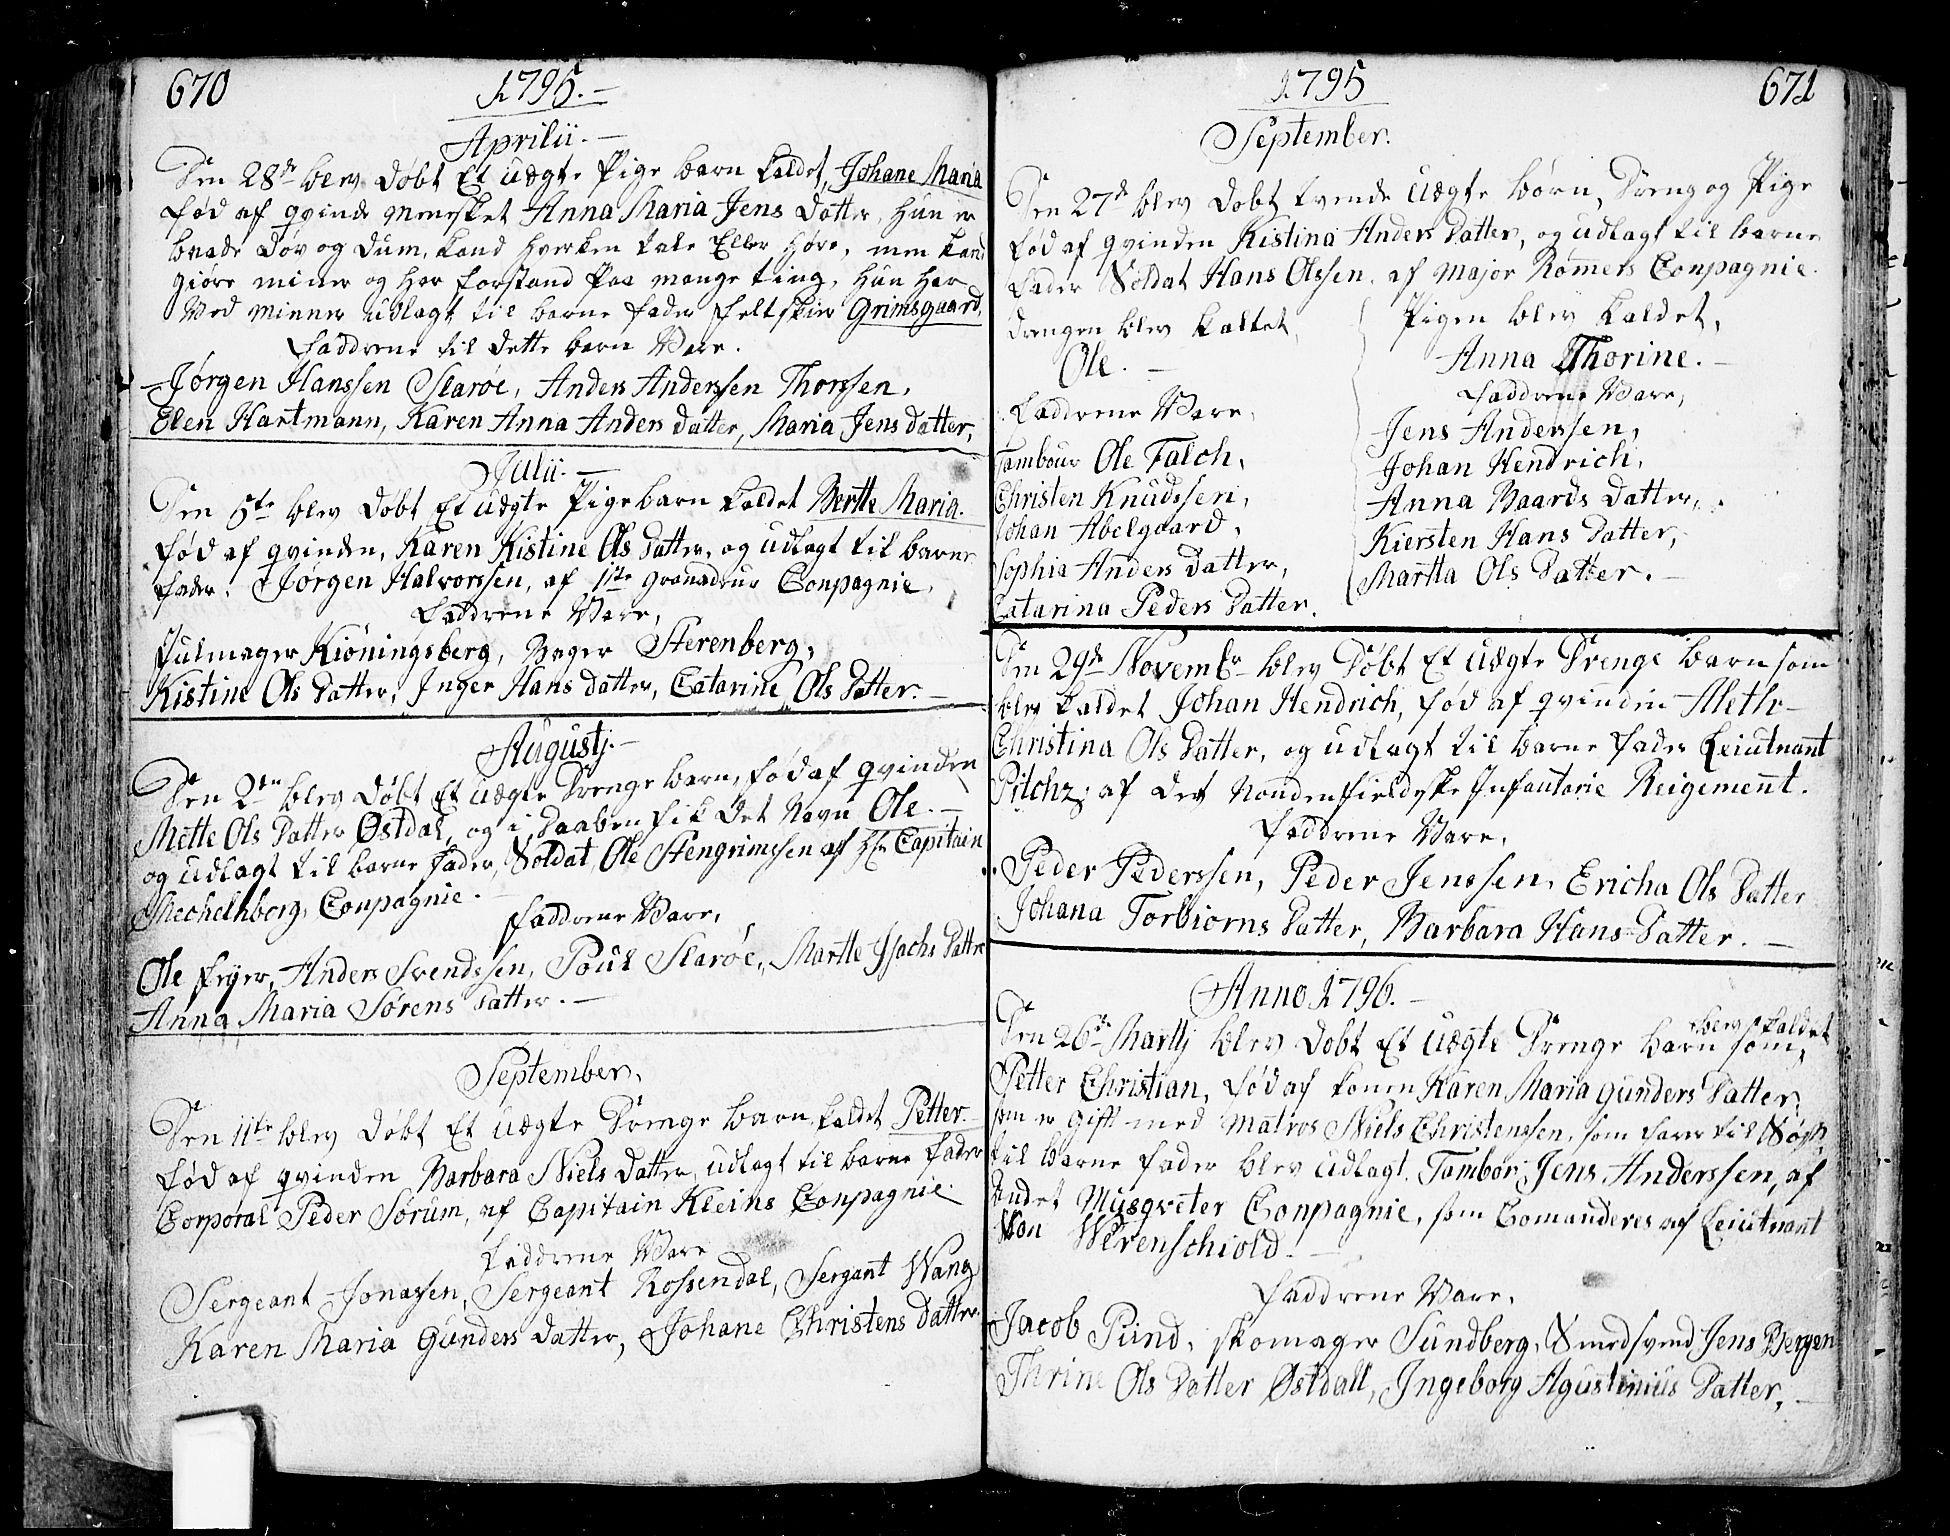 SAO, Fredrikstad prestekontor Kirkebøker, F/Fa/L0002: Ministerialbok nr. 2, 1750-1804, s. 670-671